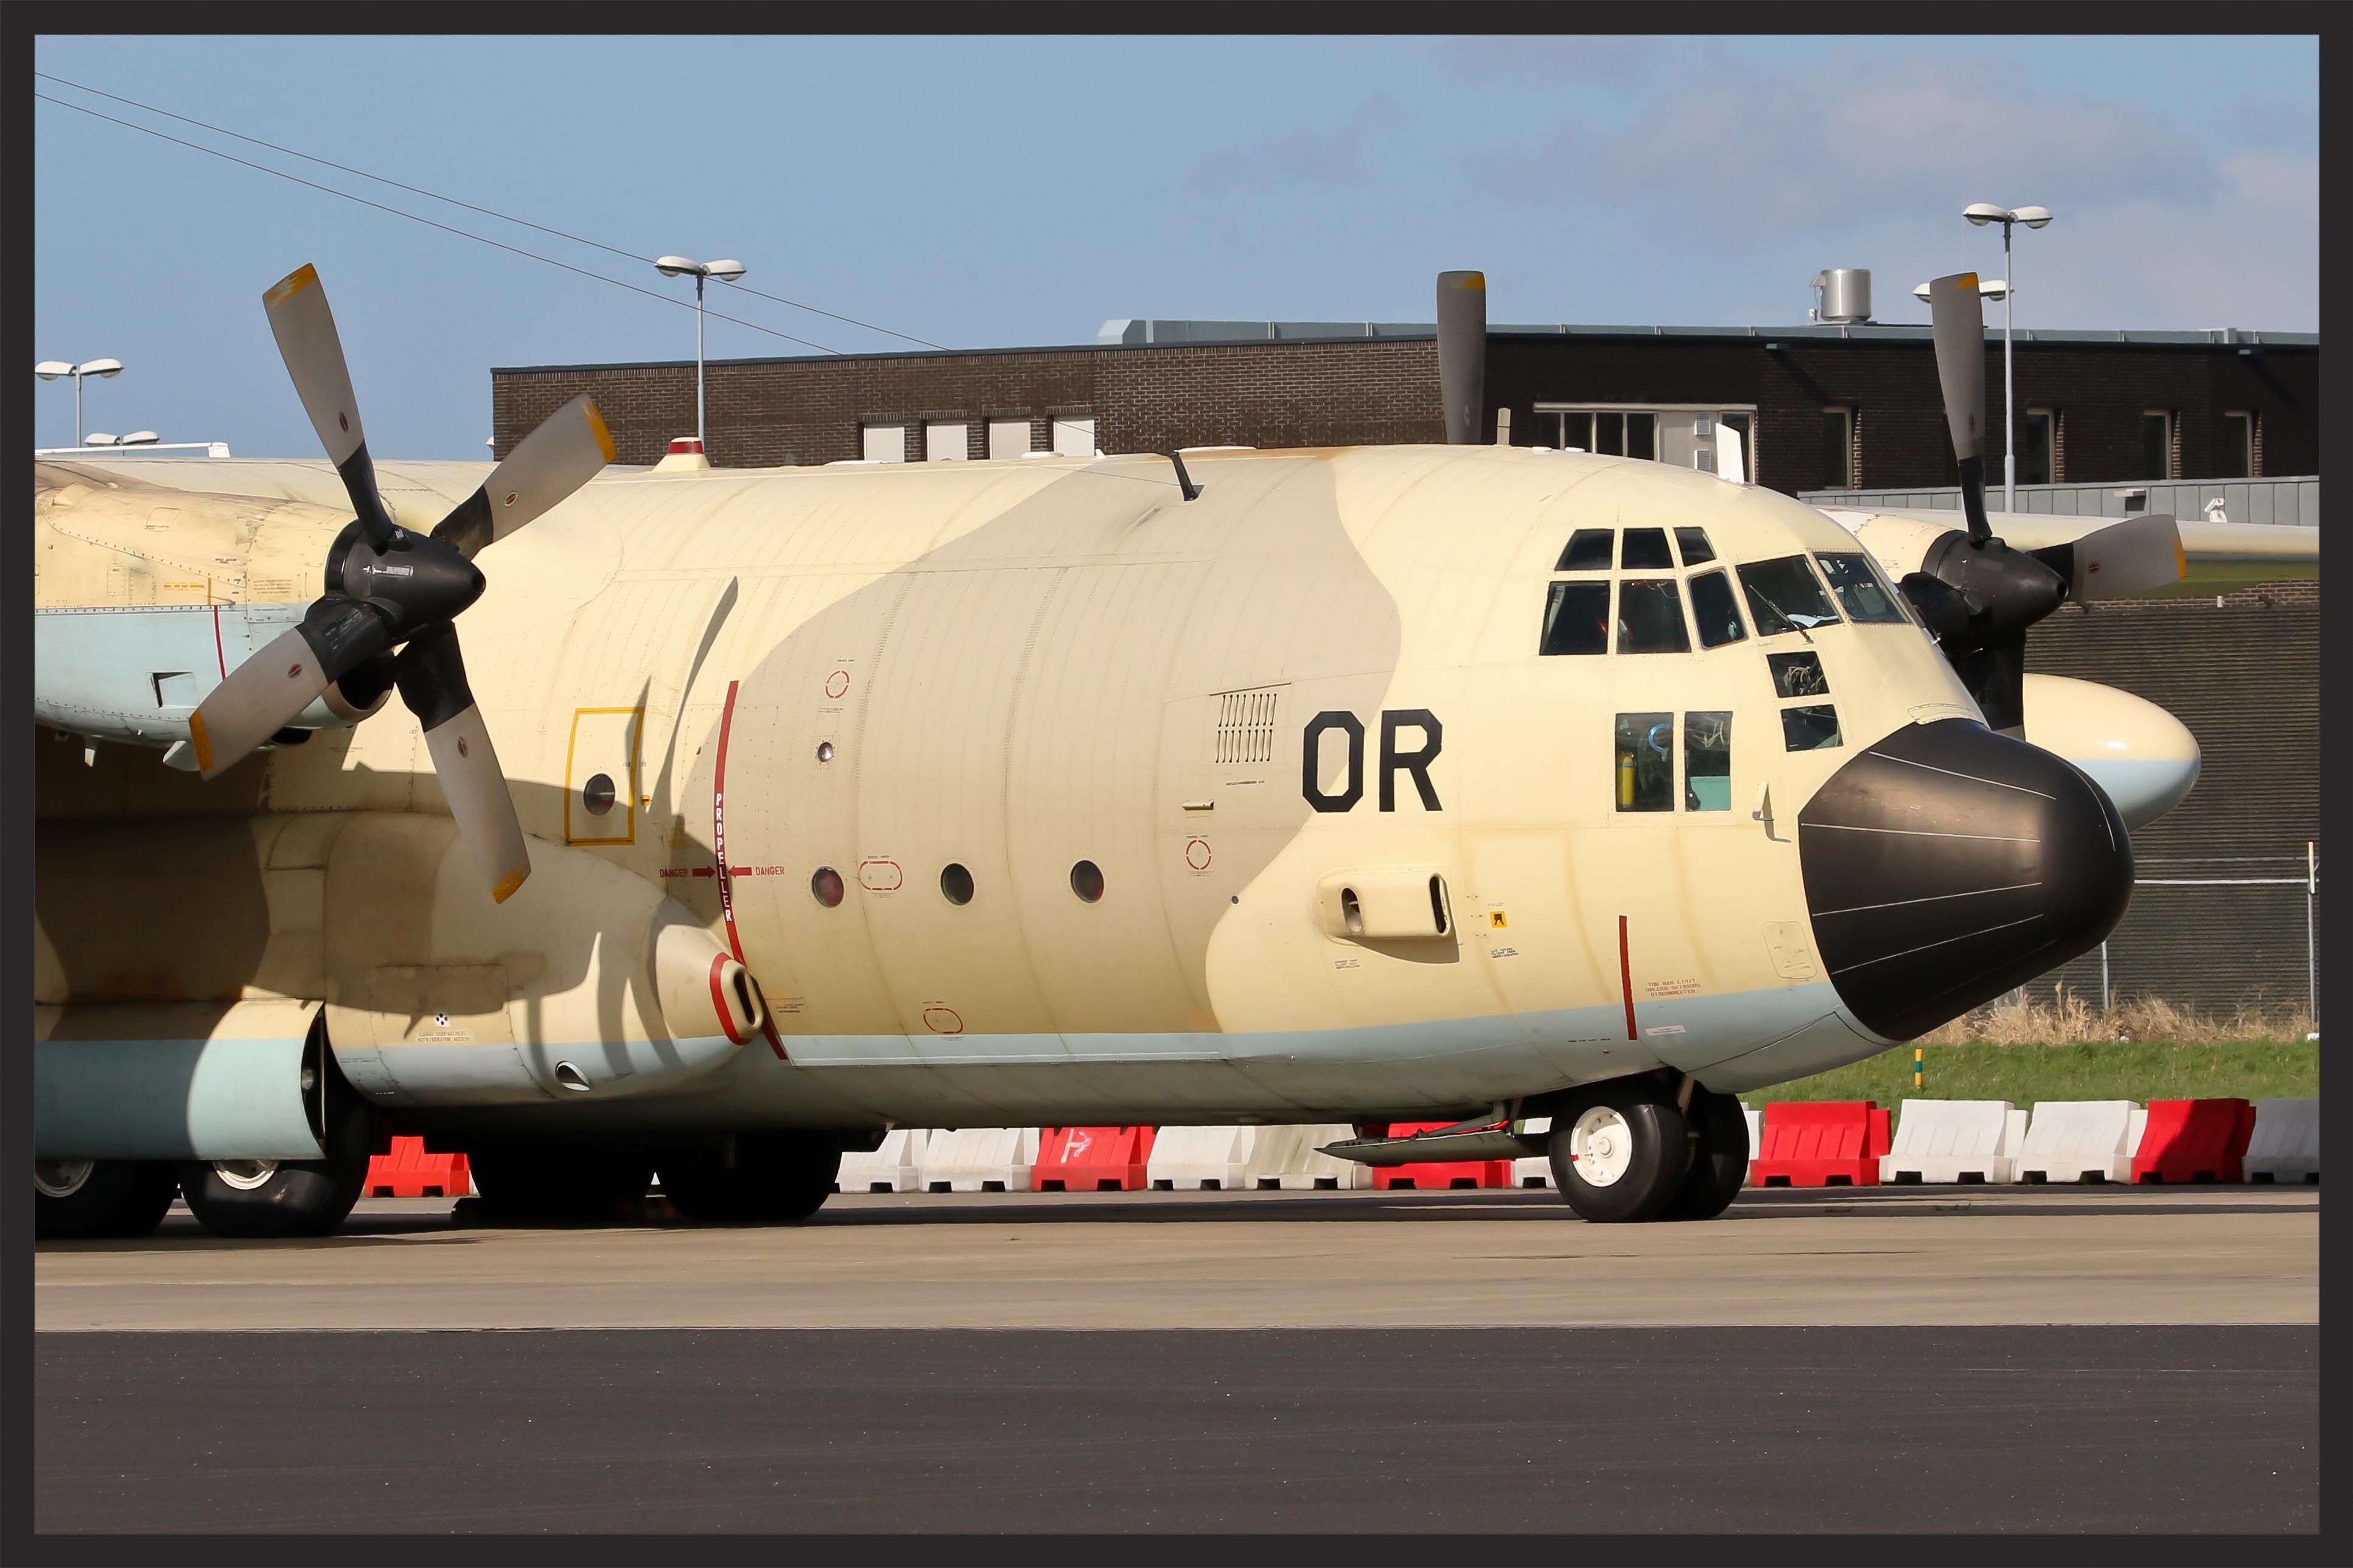 FRA: Photos d'avions de transport - Page 27 26130542496_3a4d74b247_o